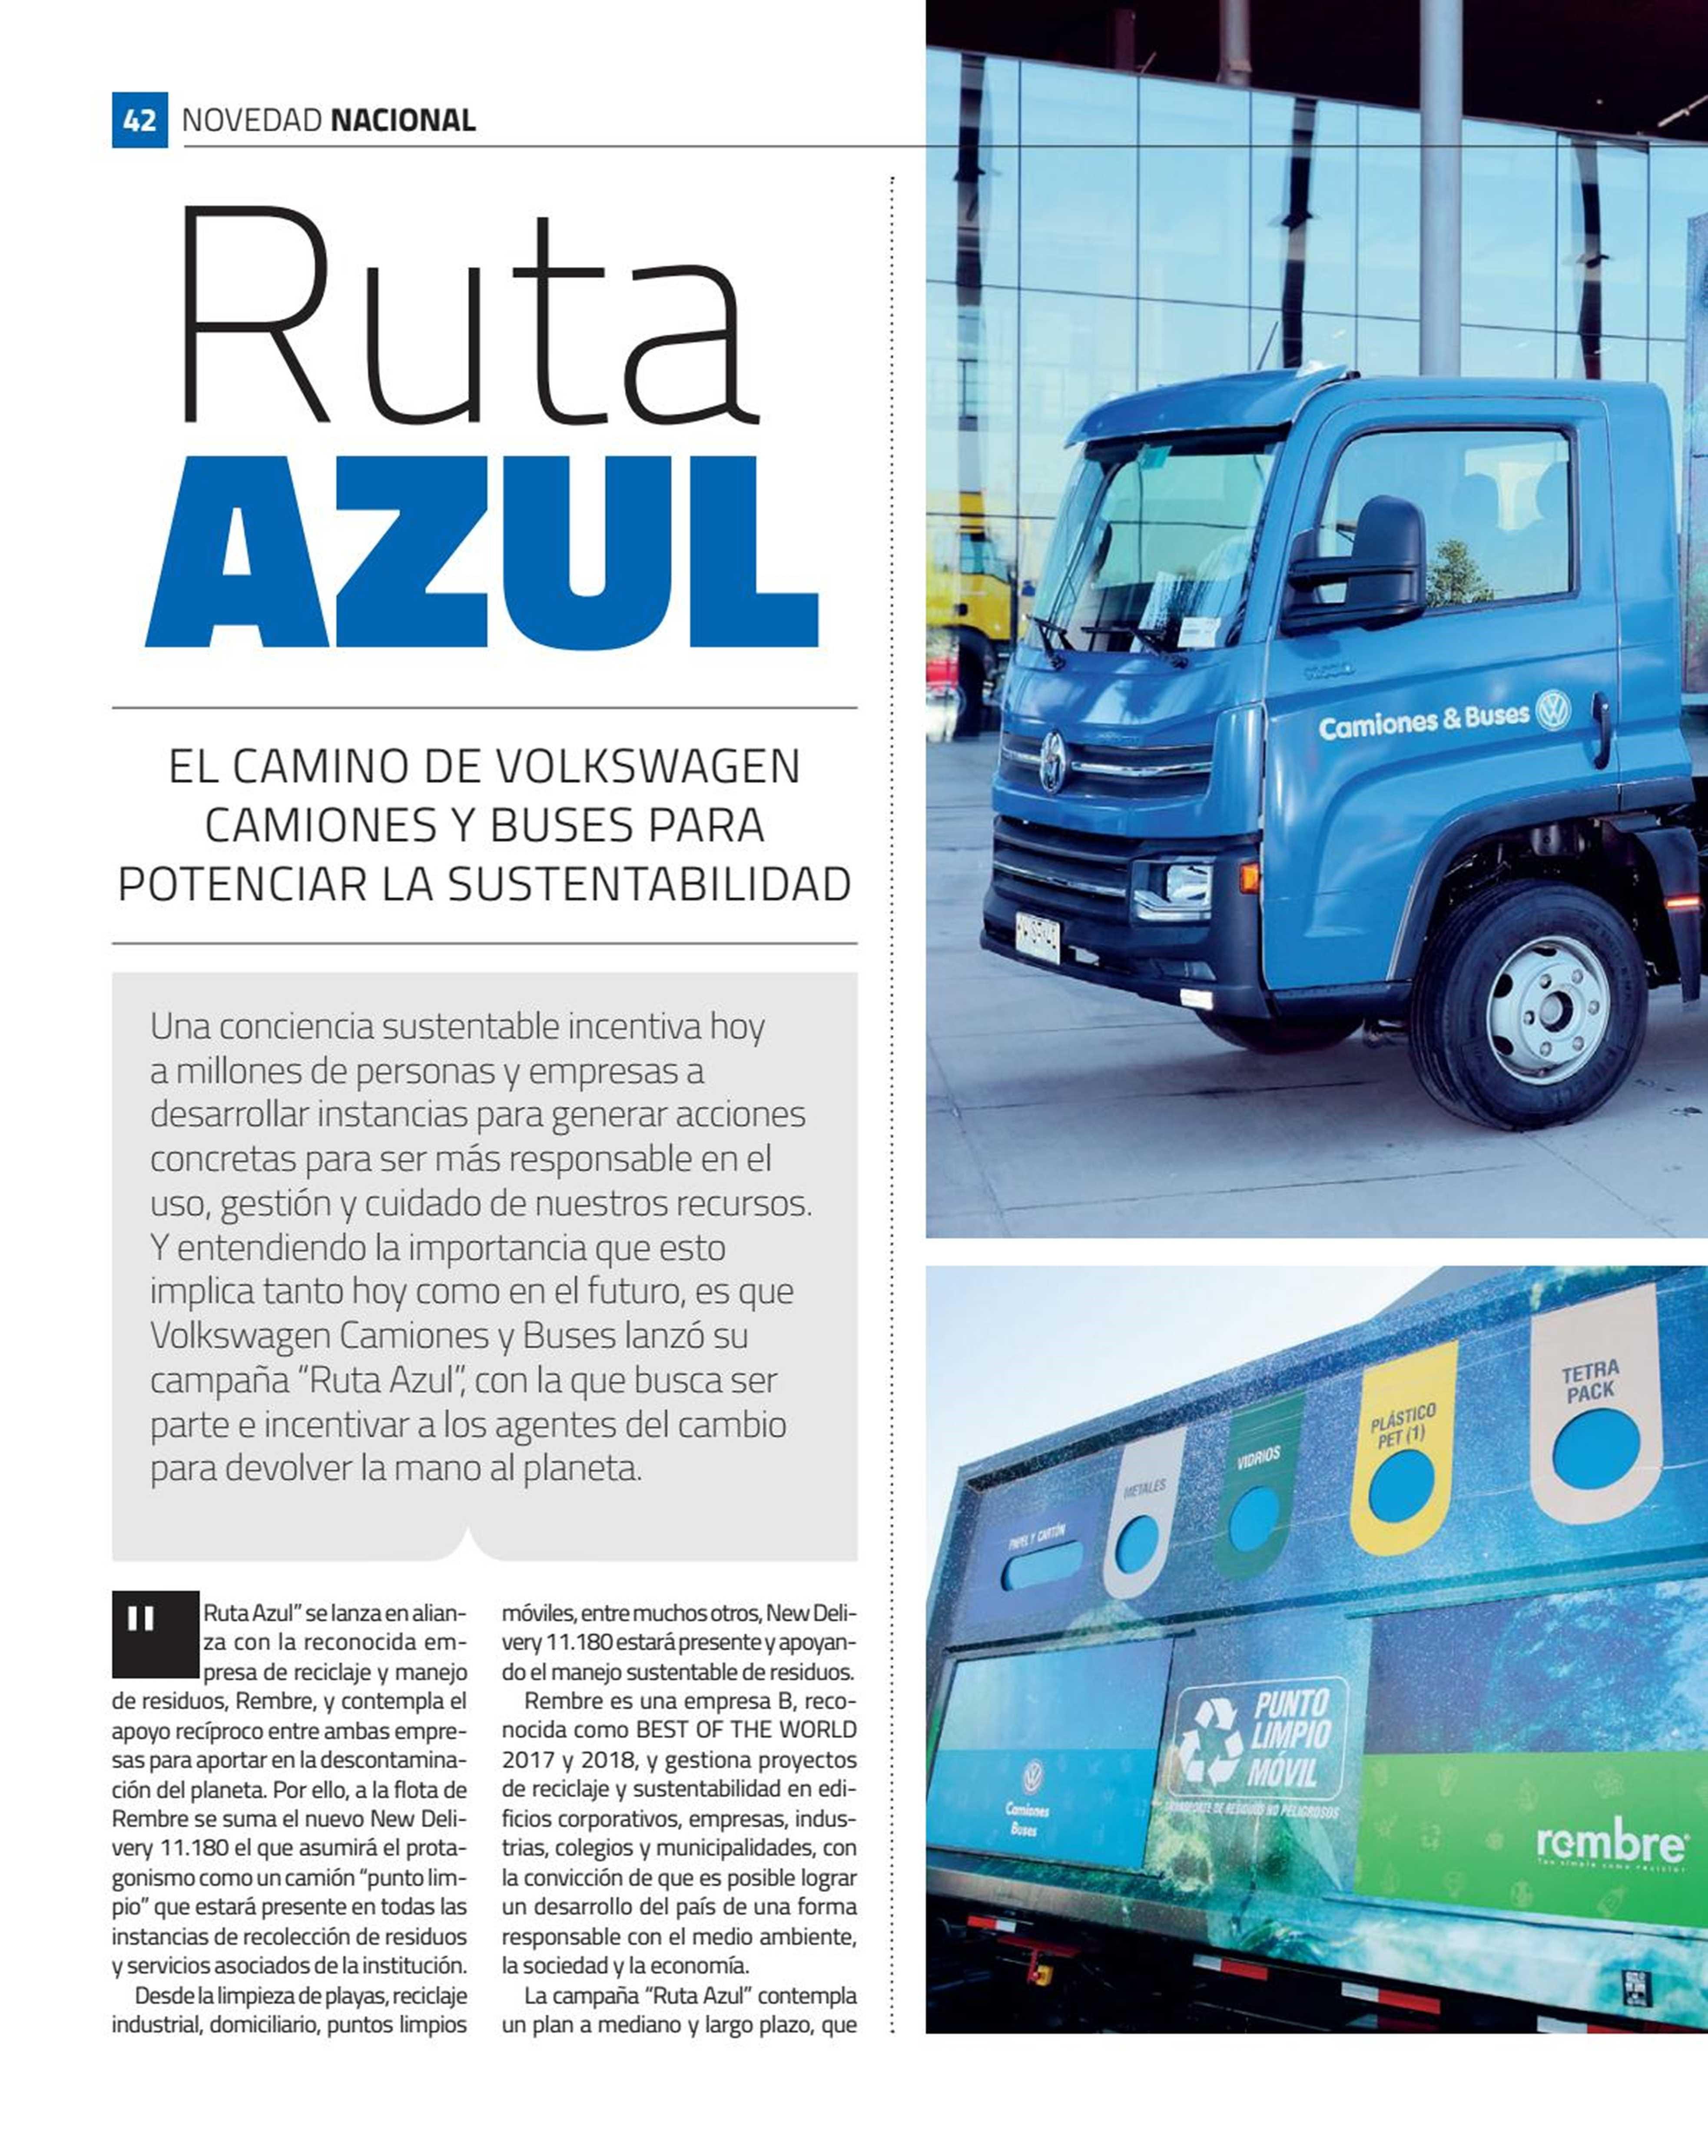 Transporte Total, Ruta Azul.